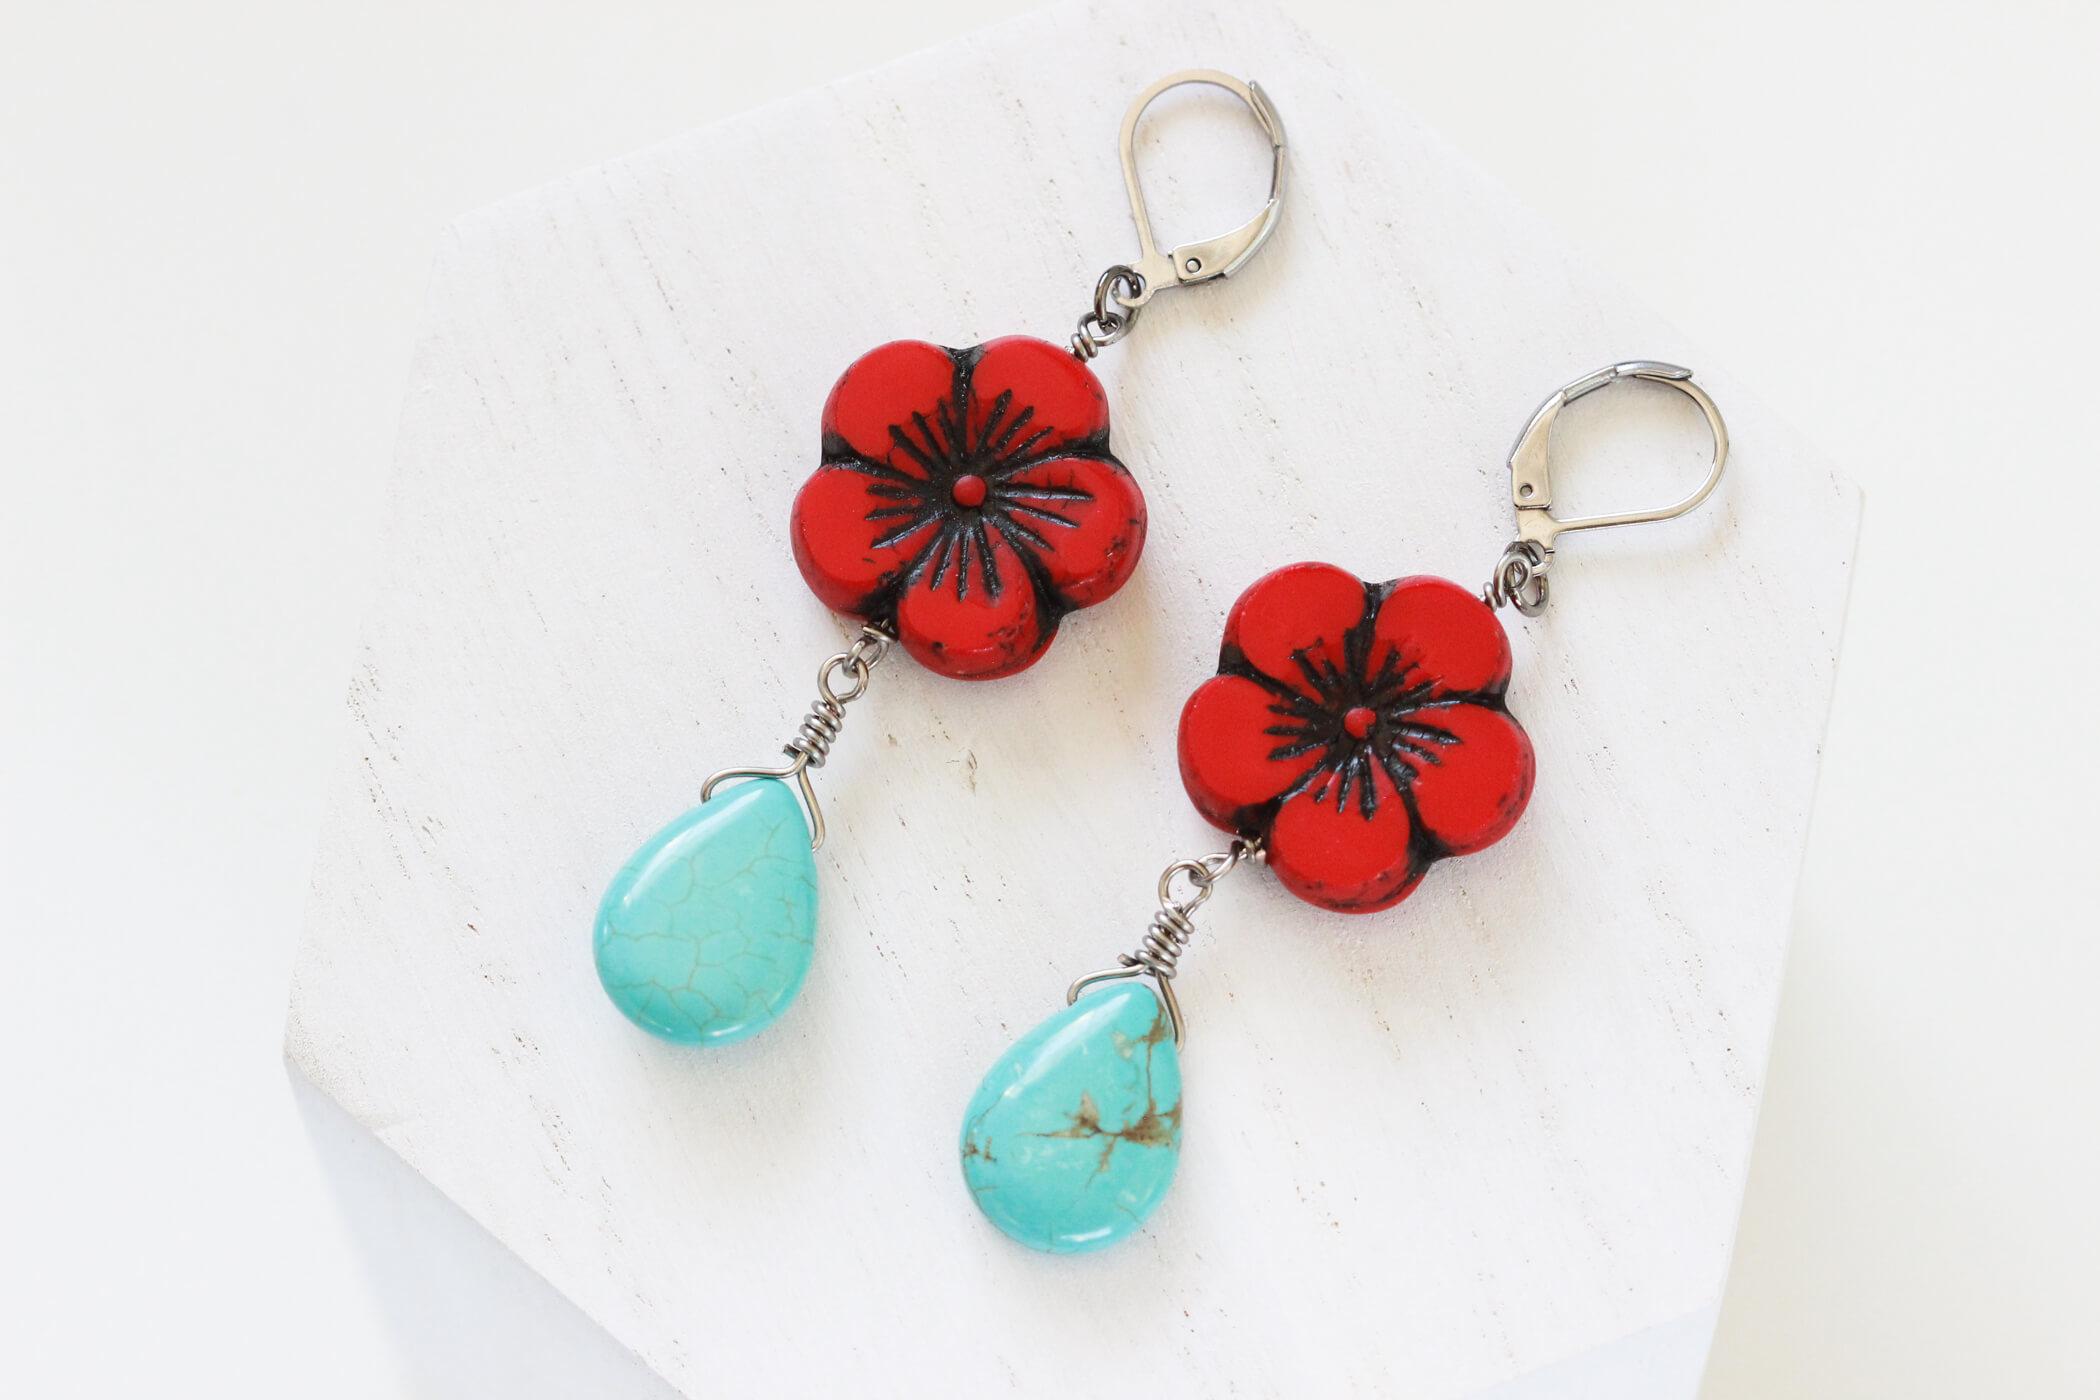 Red Flower Earrings – Simple Drop Earrings by Kaleidoscopes And Polka Dots